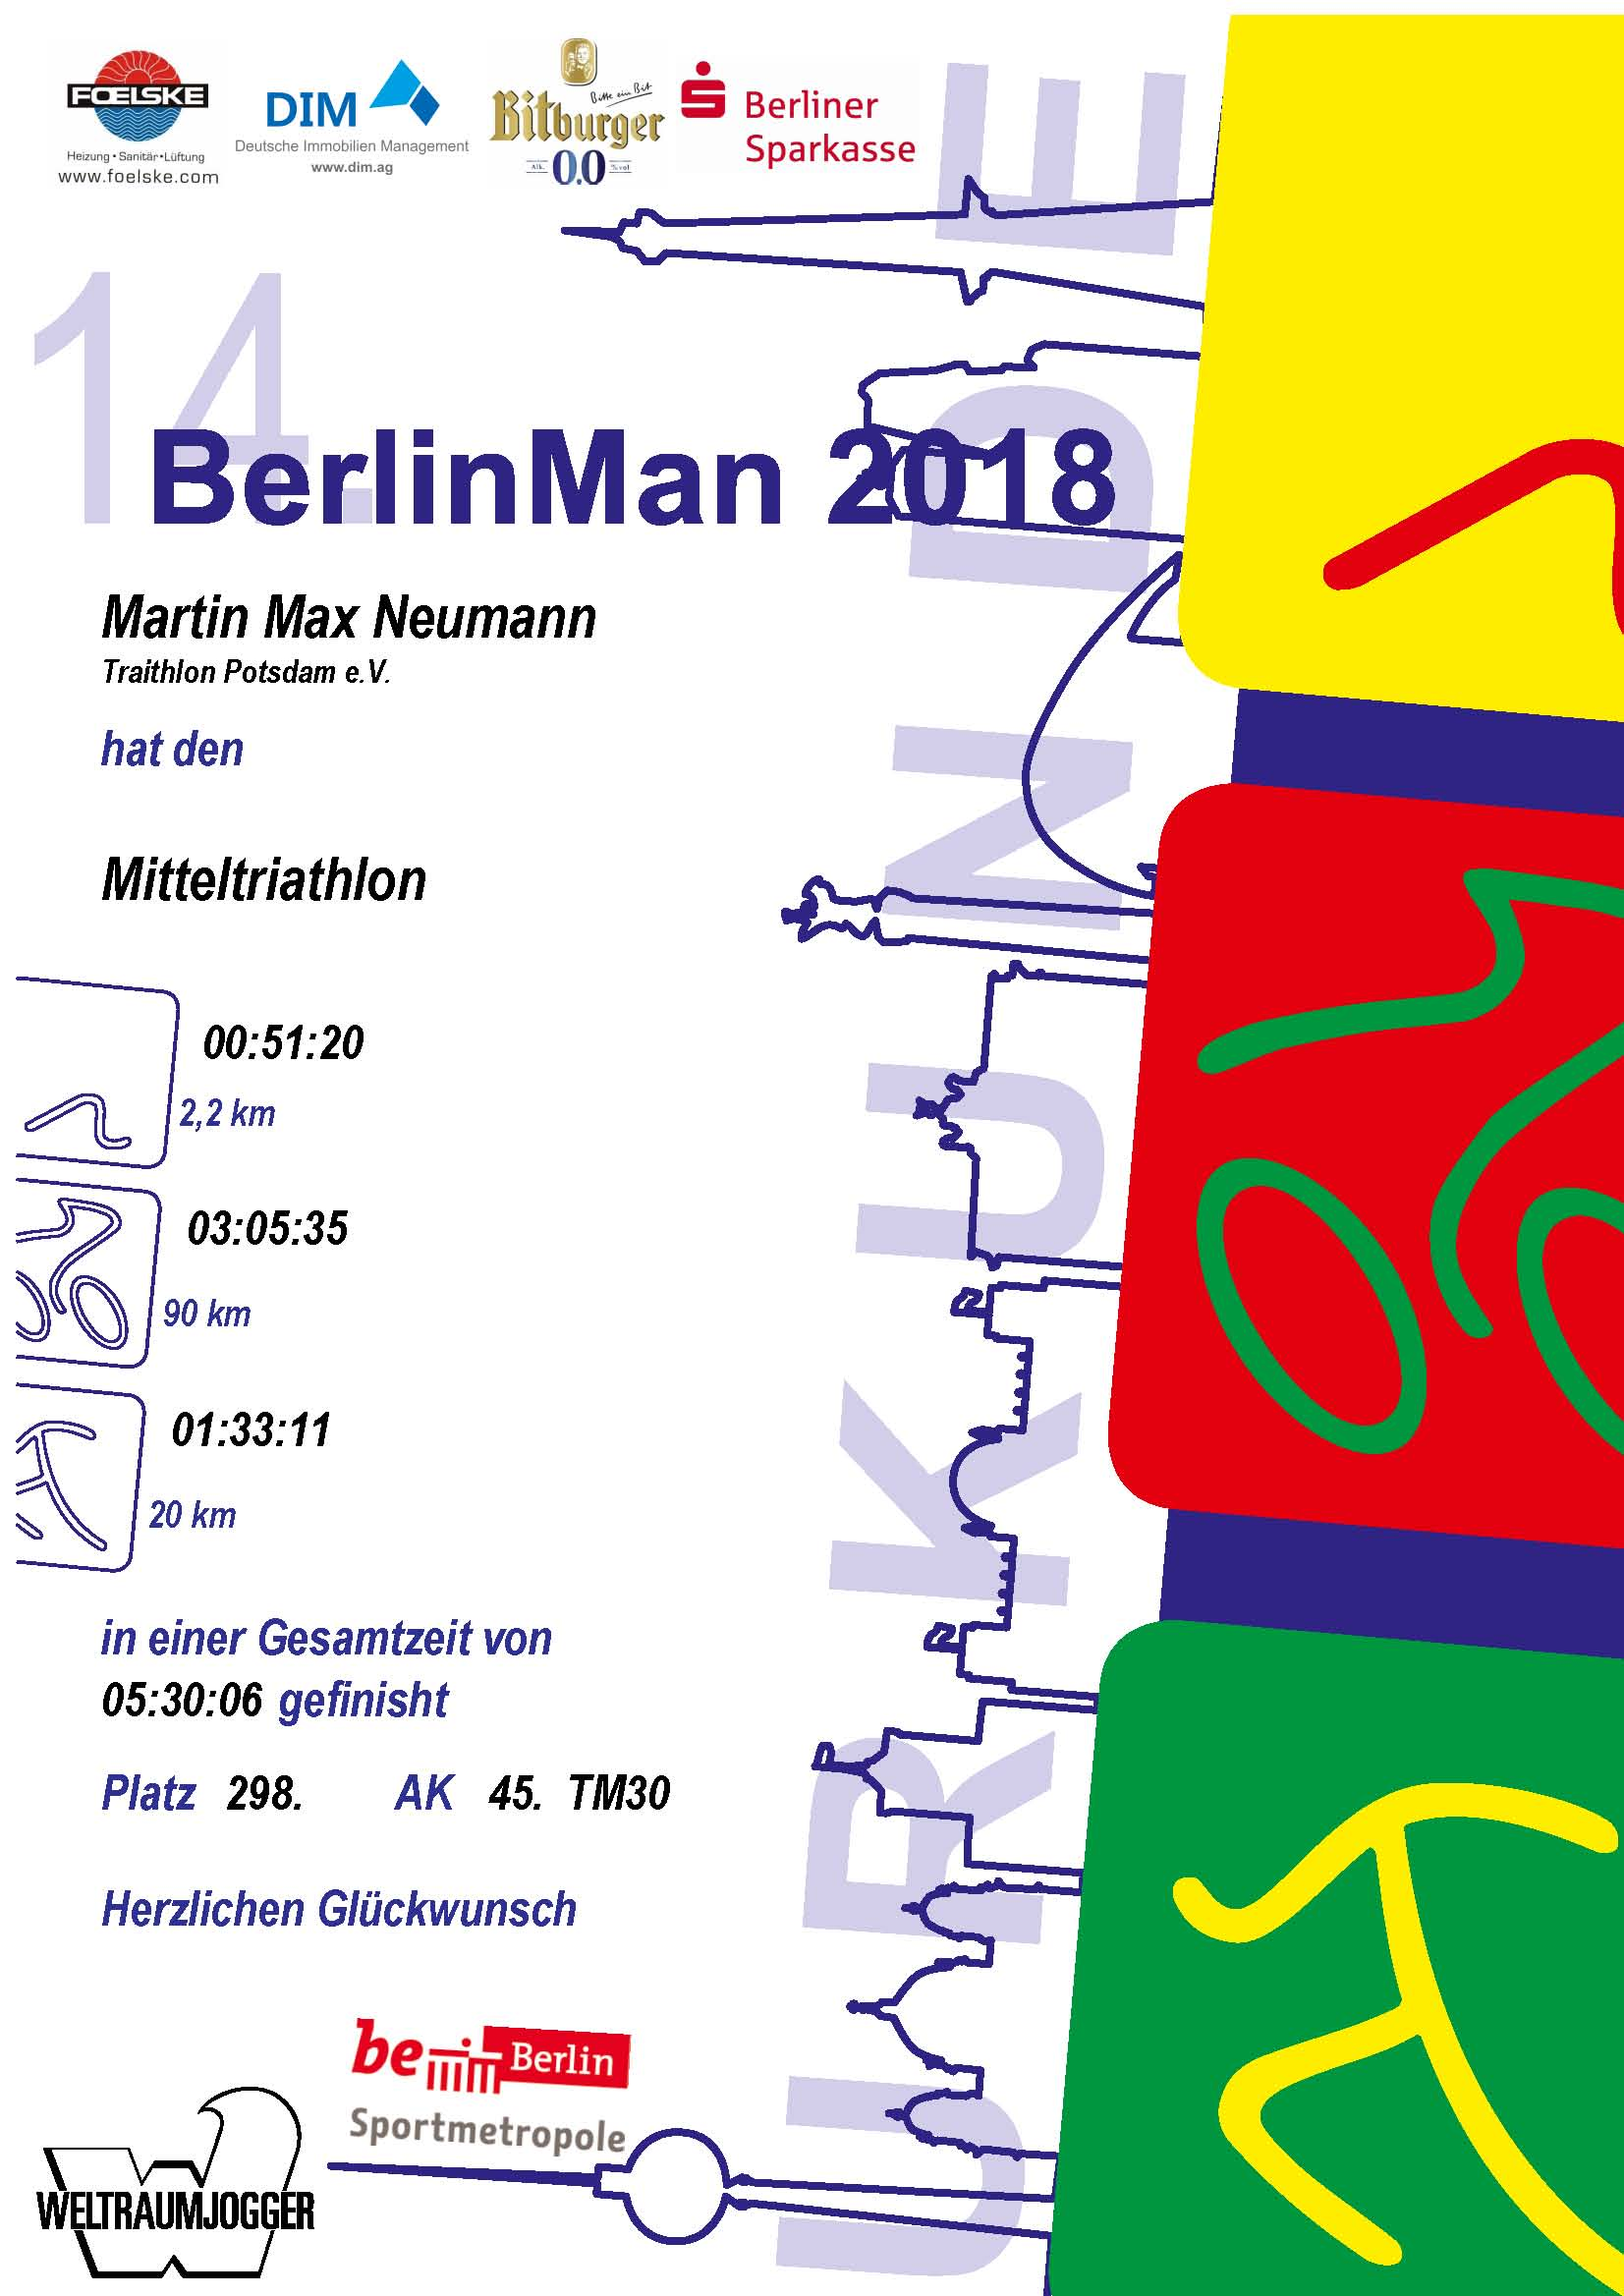 BerlinManMitteltri2018_22491